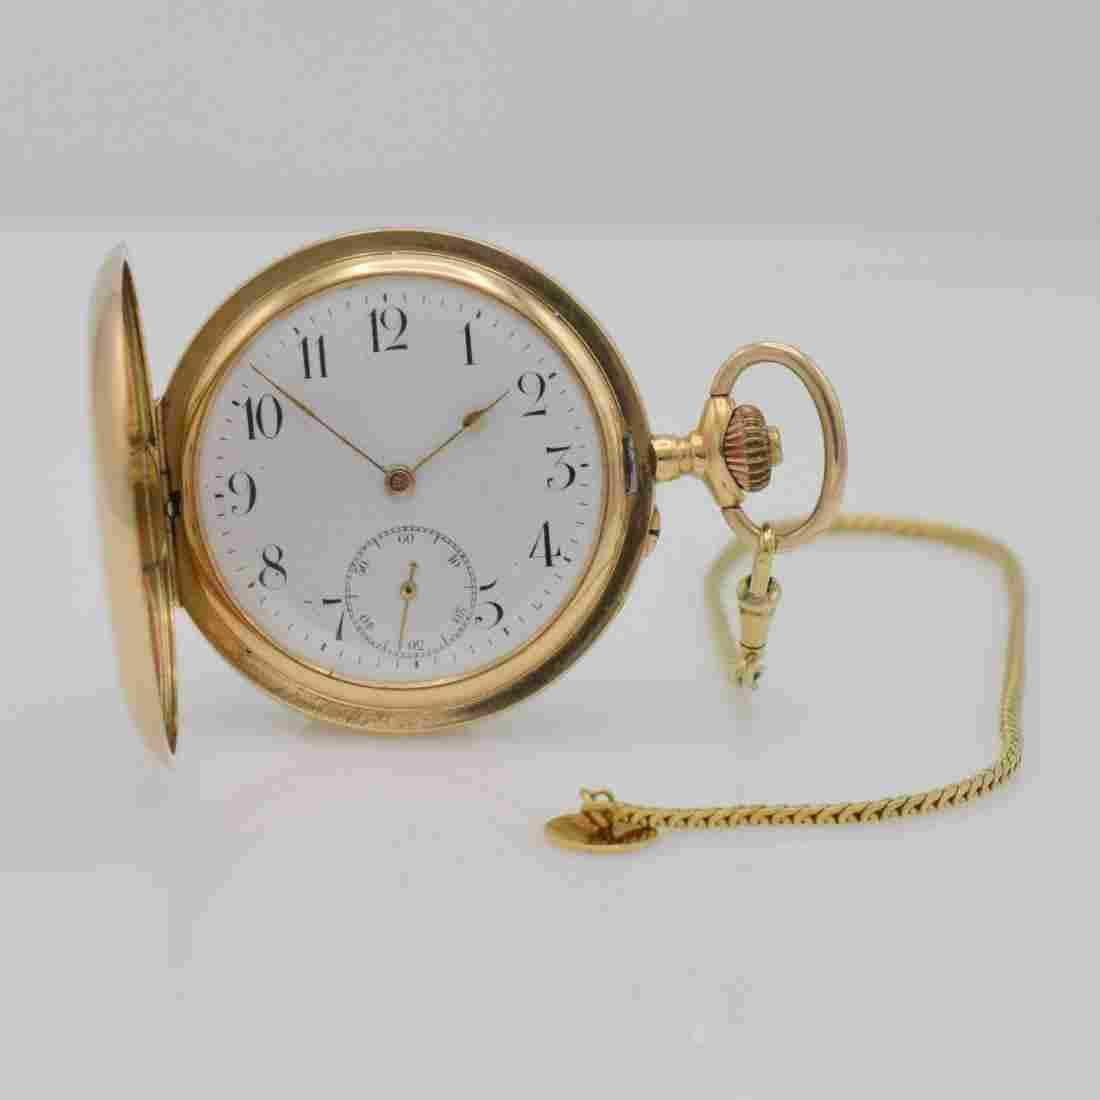 14k pink gold hunting cased pocket watch